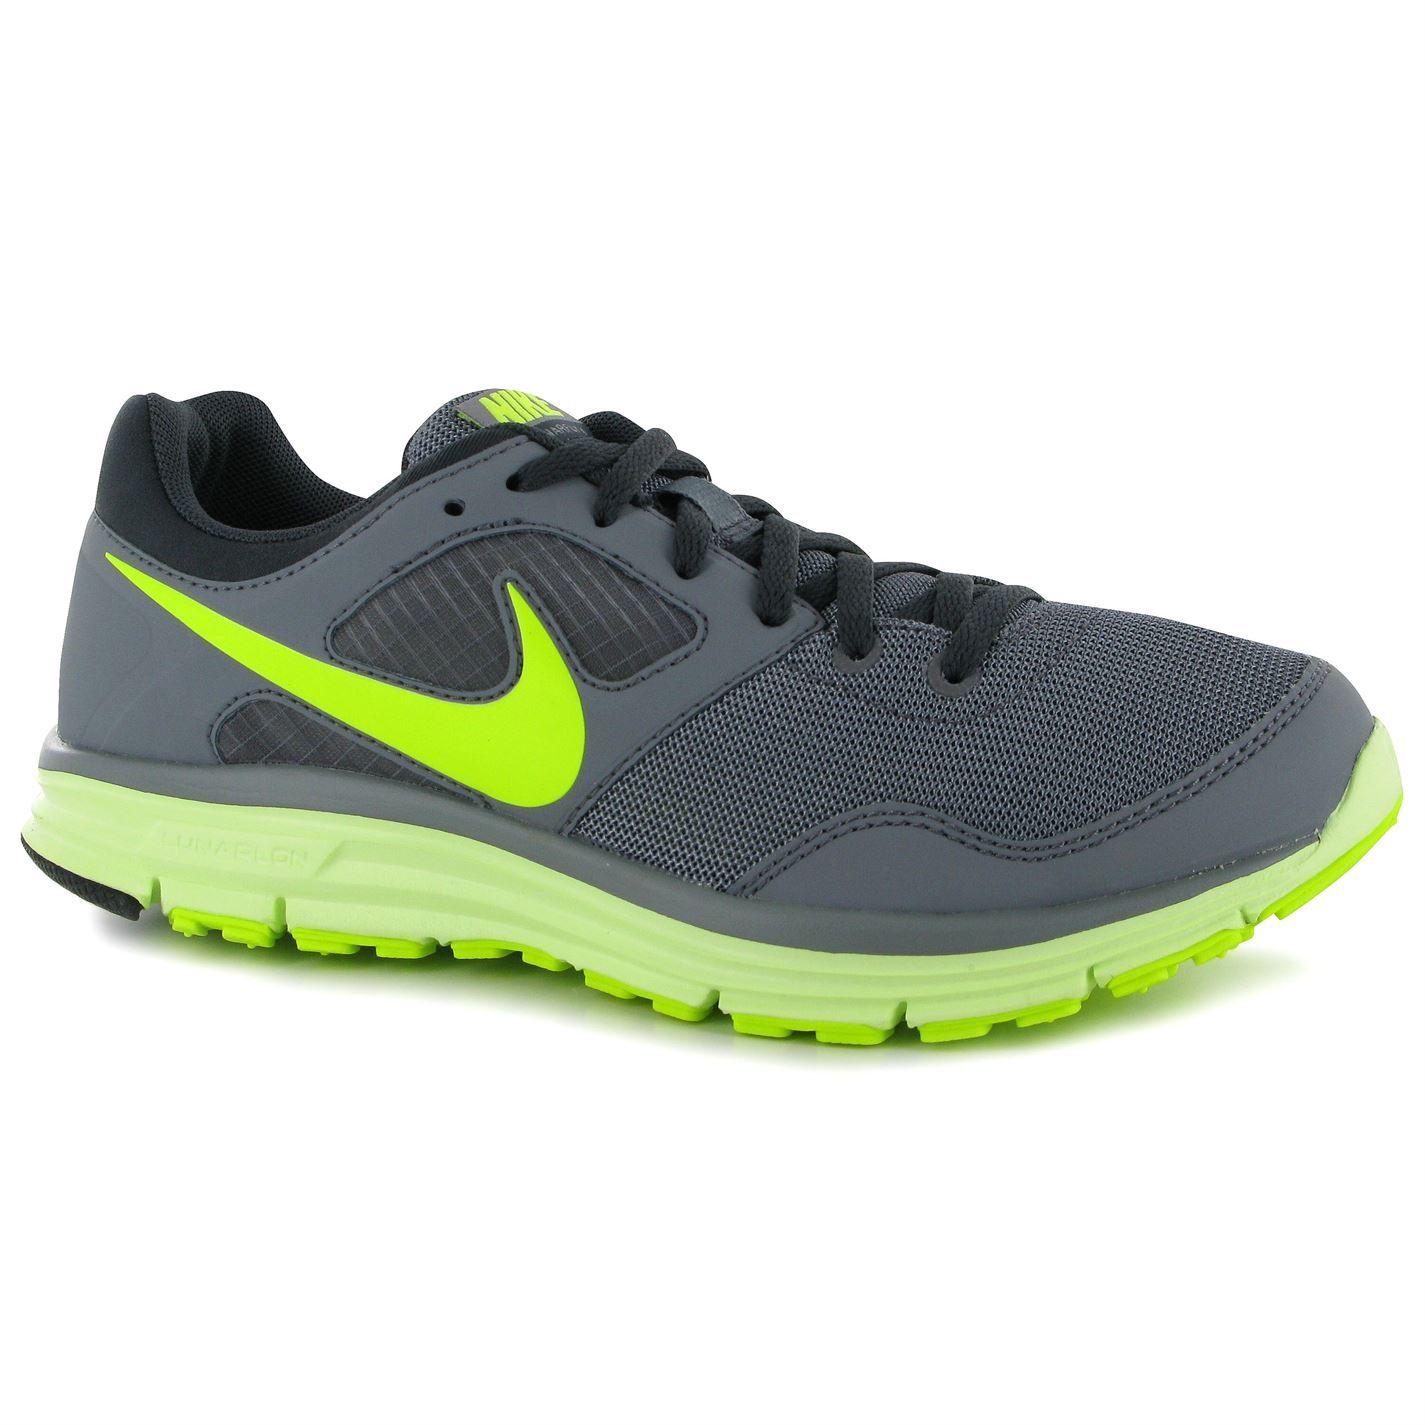 Nike Air Relentless 4 Men's Running Shoes Green COMUK:5875